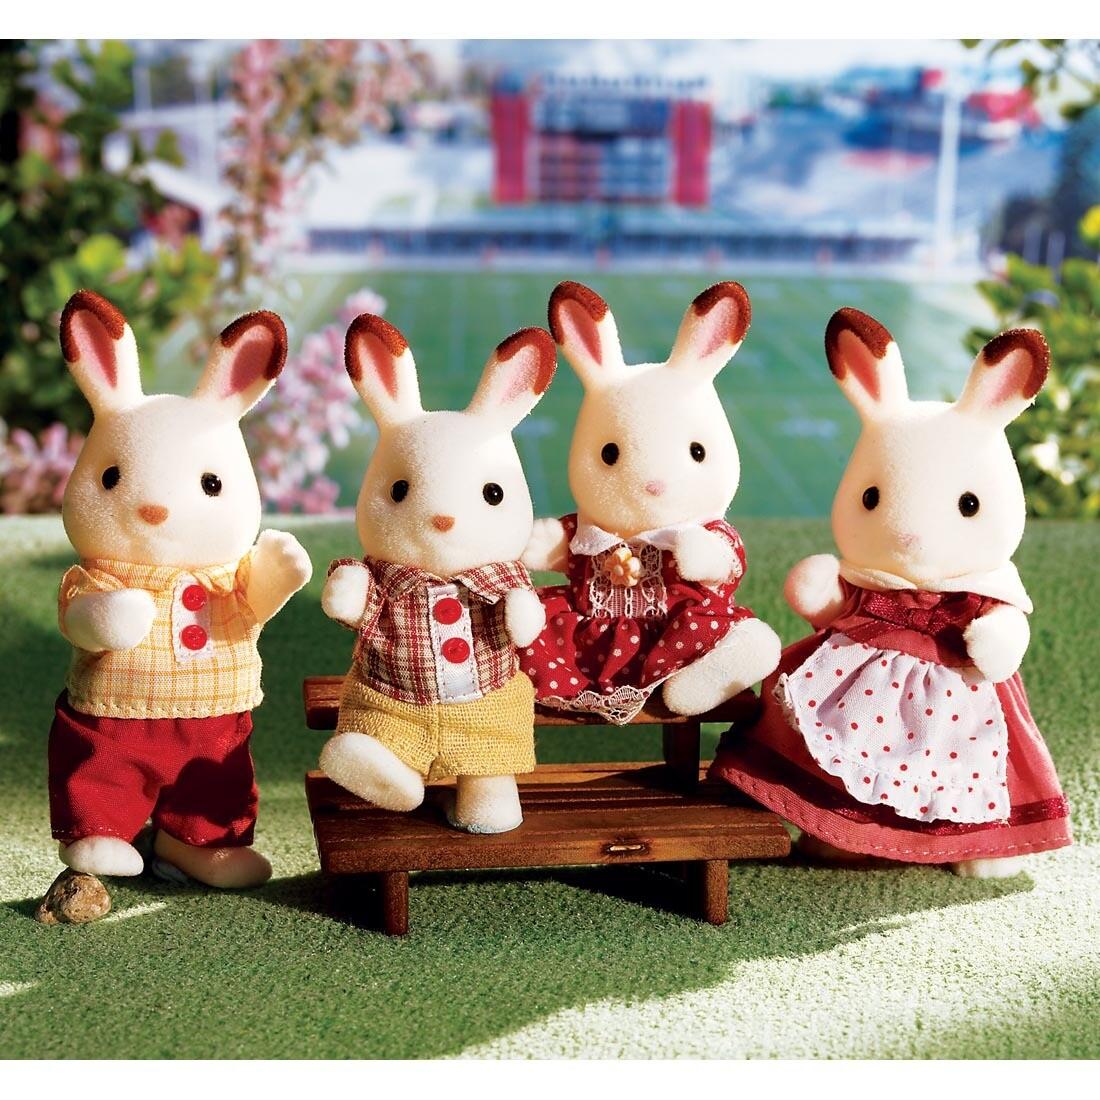 Calico Critter Hopscotch Rabbit Family